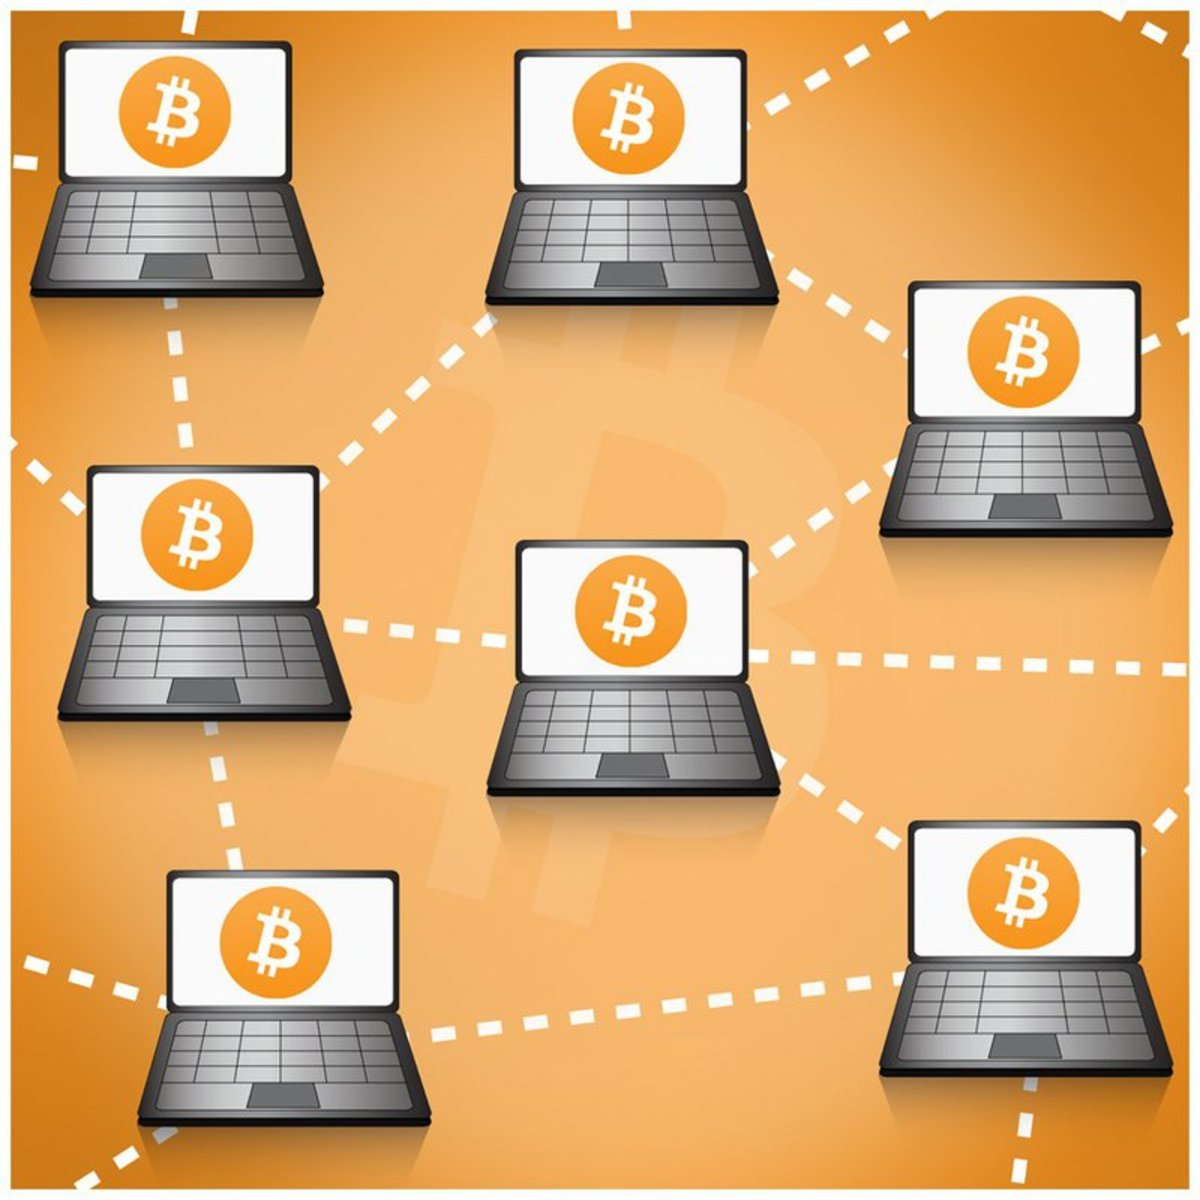 Op-ed - Decentralization: Key to Bitcoin's Success